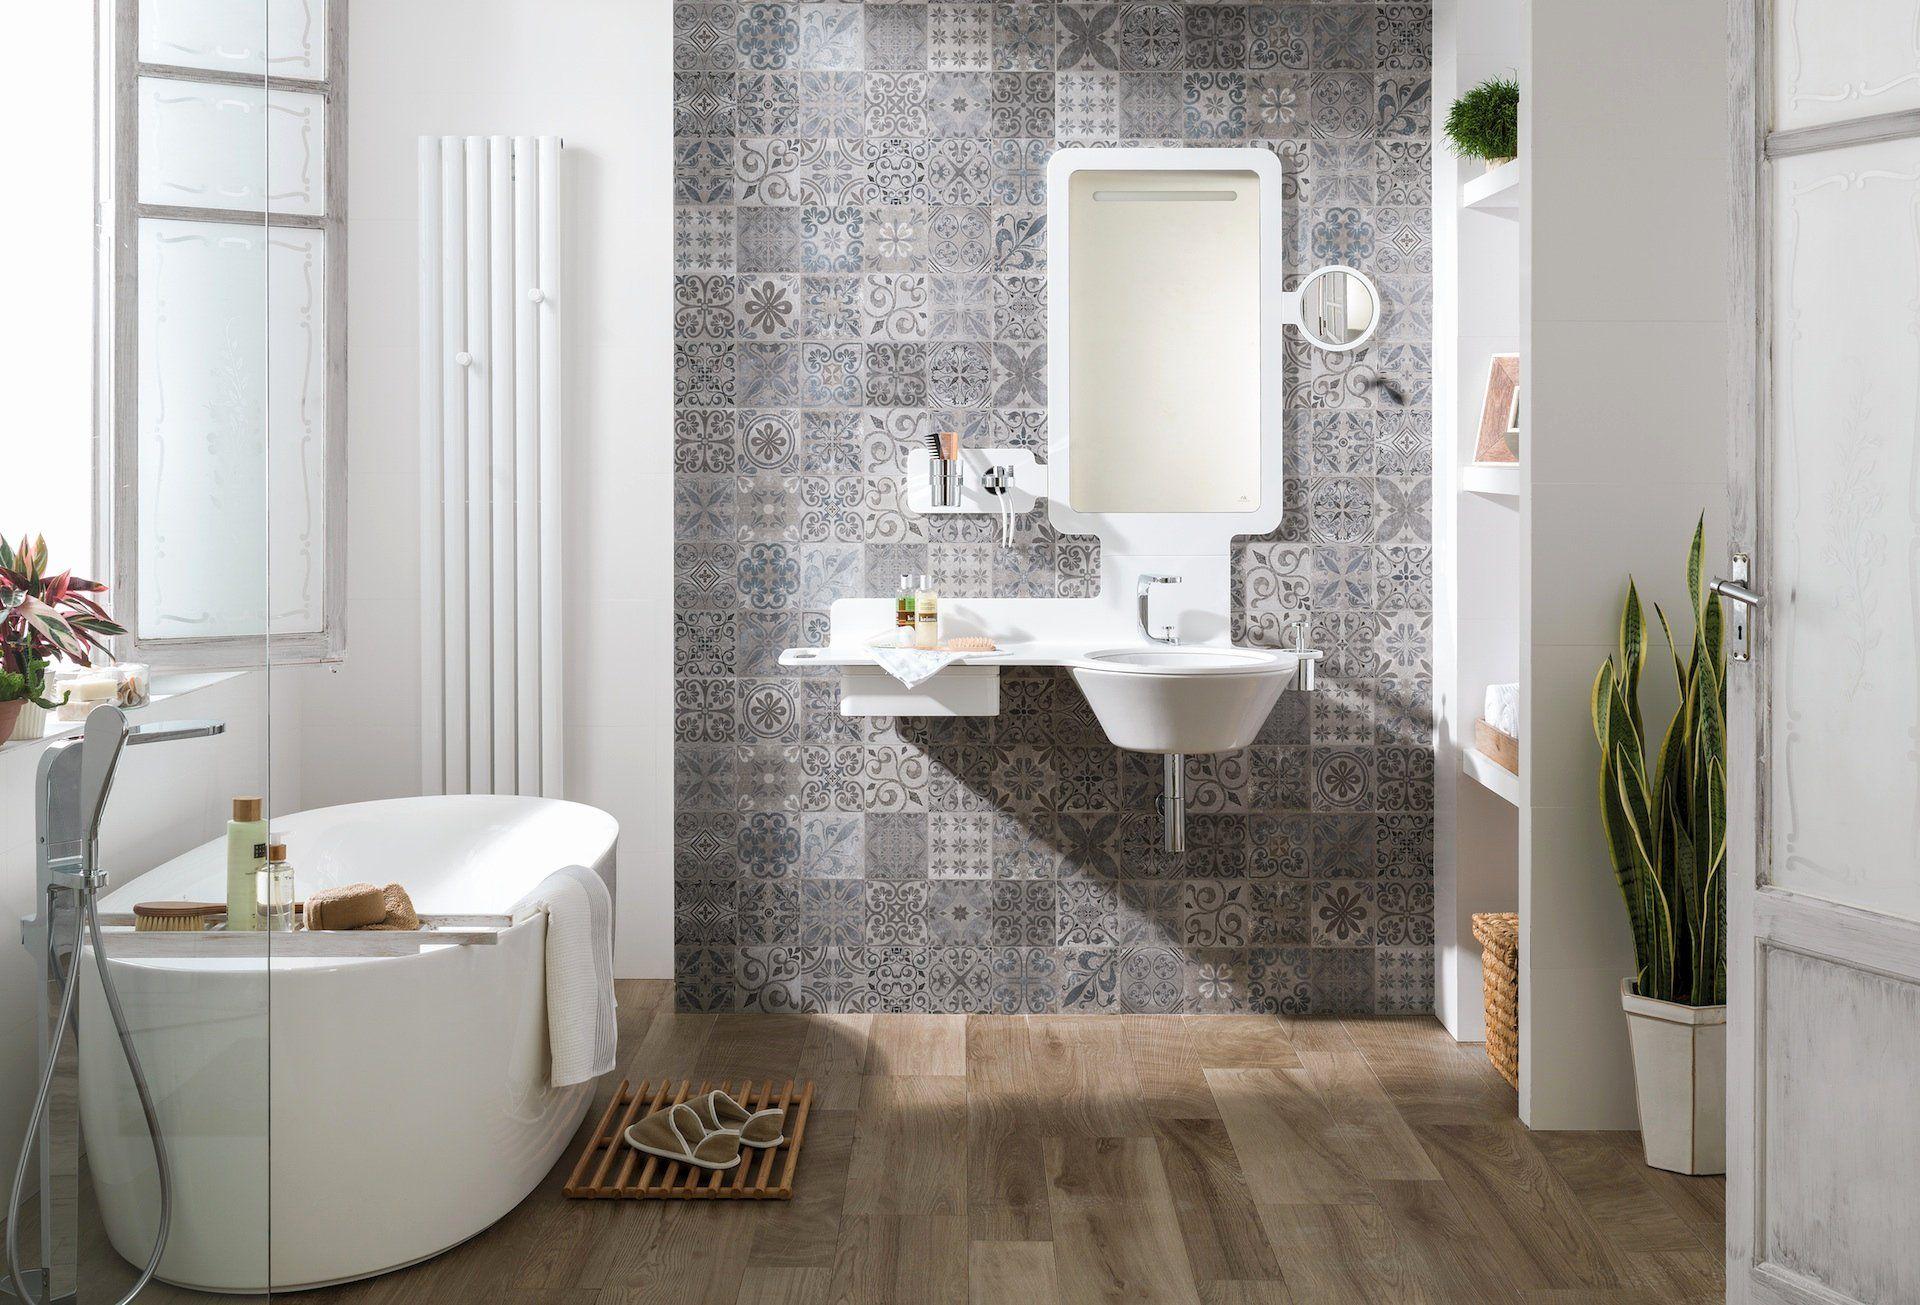 vintage bathroom tile ideas inspirational 24 amazing